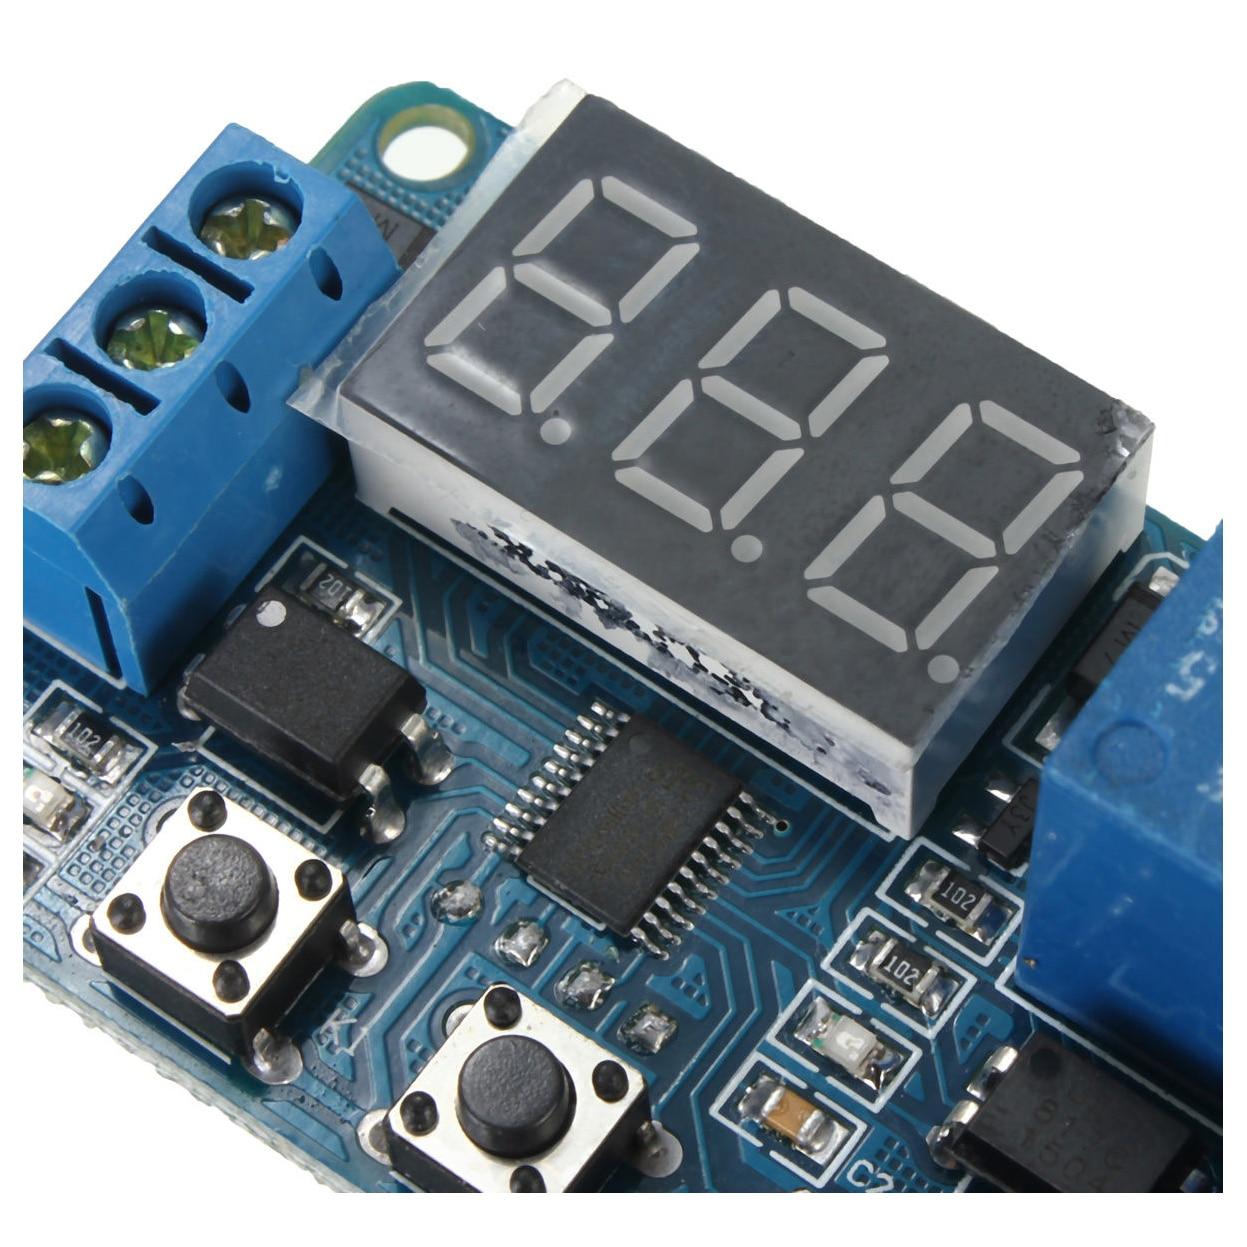 JFBL 2X Automation DC 12V LED Display Digital Delay Timer Control Switch Relay Module jfbl 2x capacimetro digitale tester capacita misuratore 5 cifre